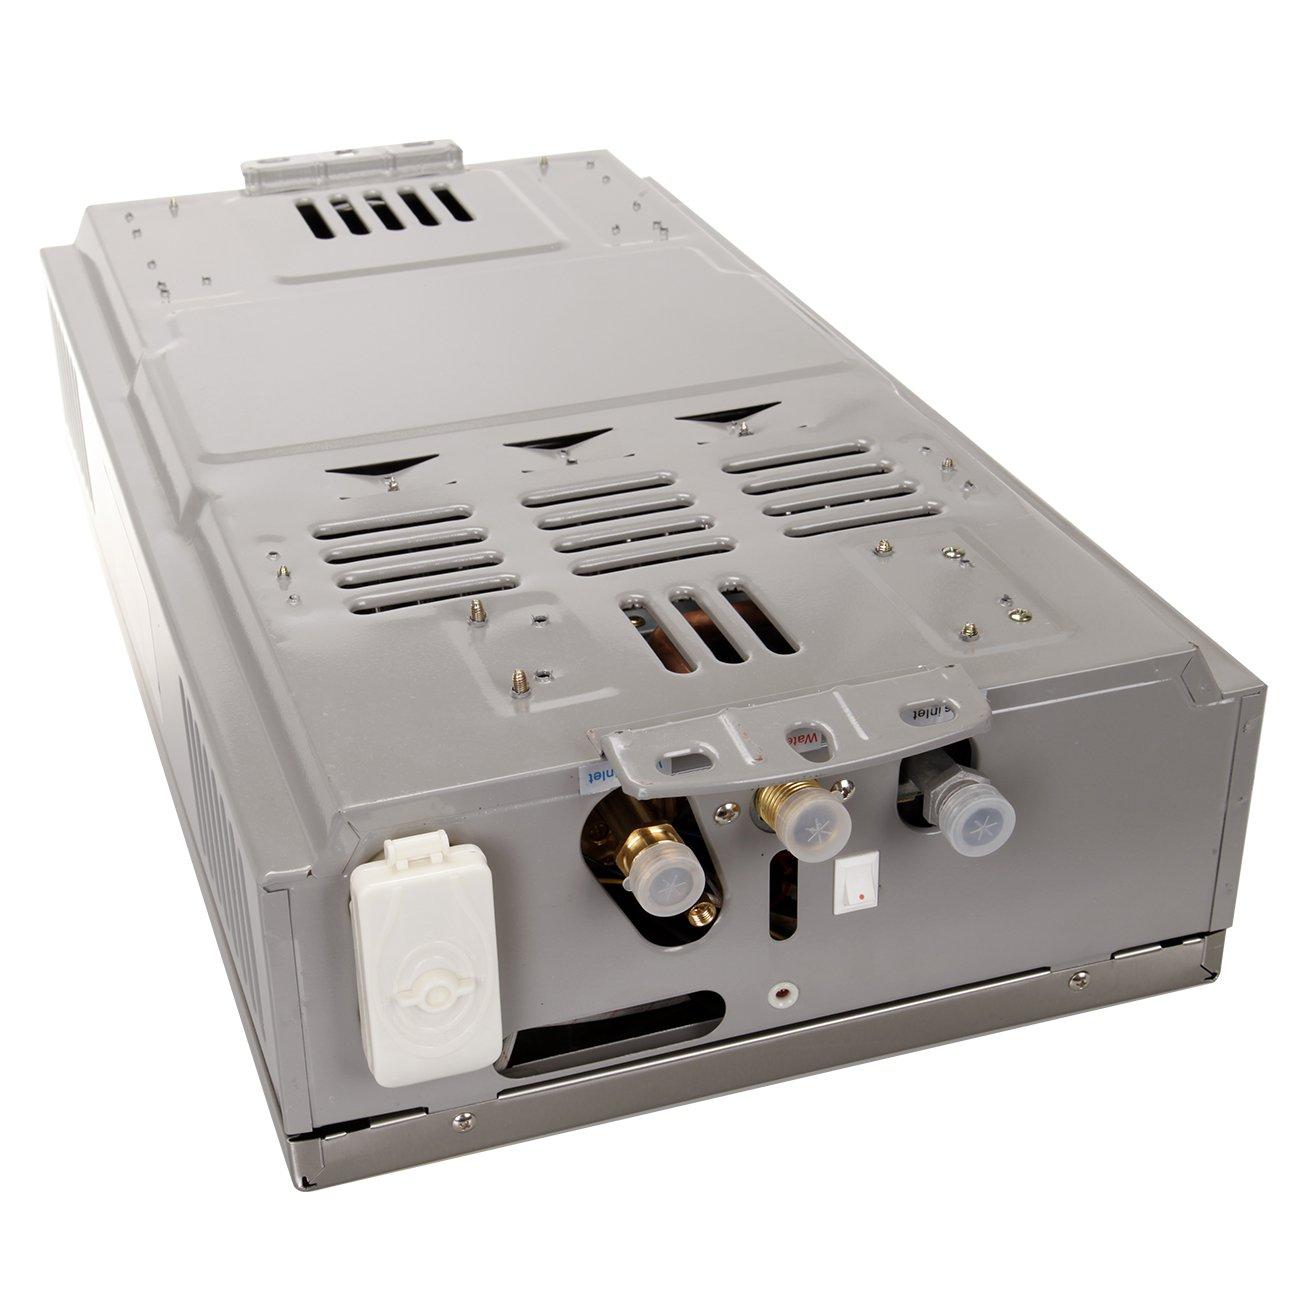 iglobalbuy 12L casa GLP calentador de gas caliente caliente calentador de agua instant/áneo caldera de acero inoxidable